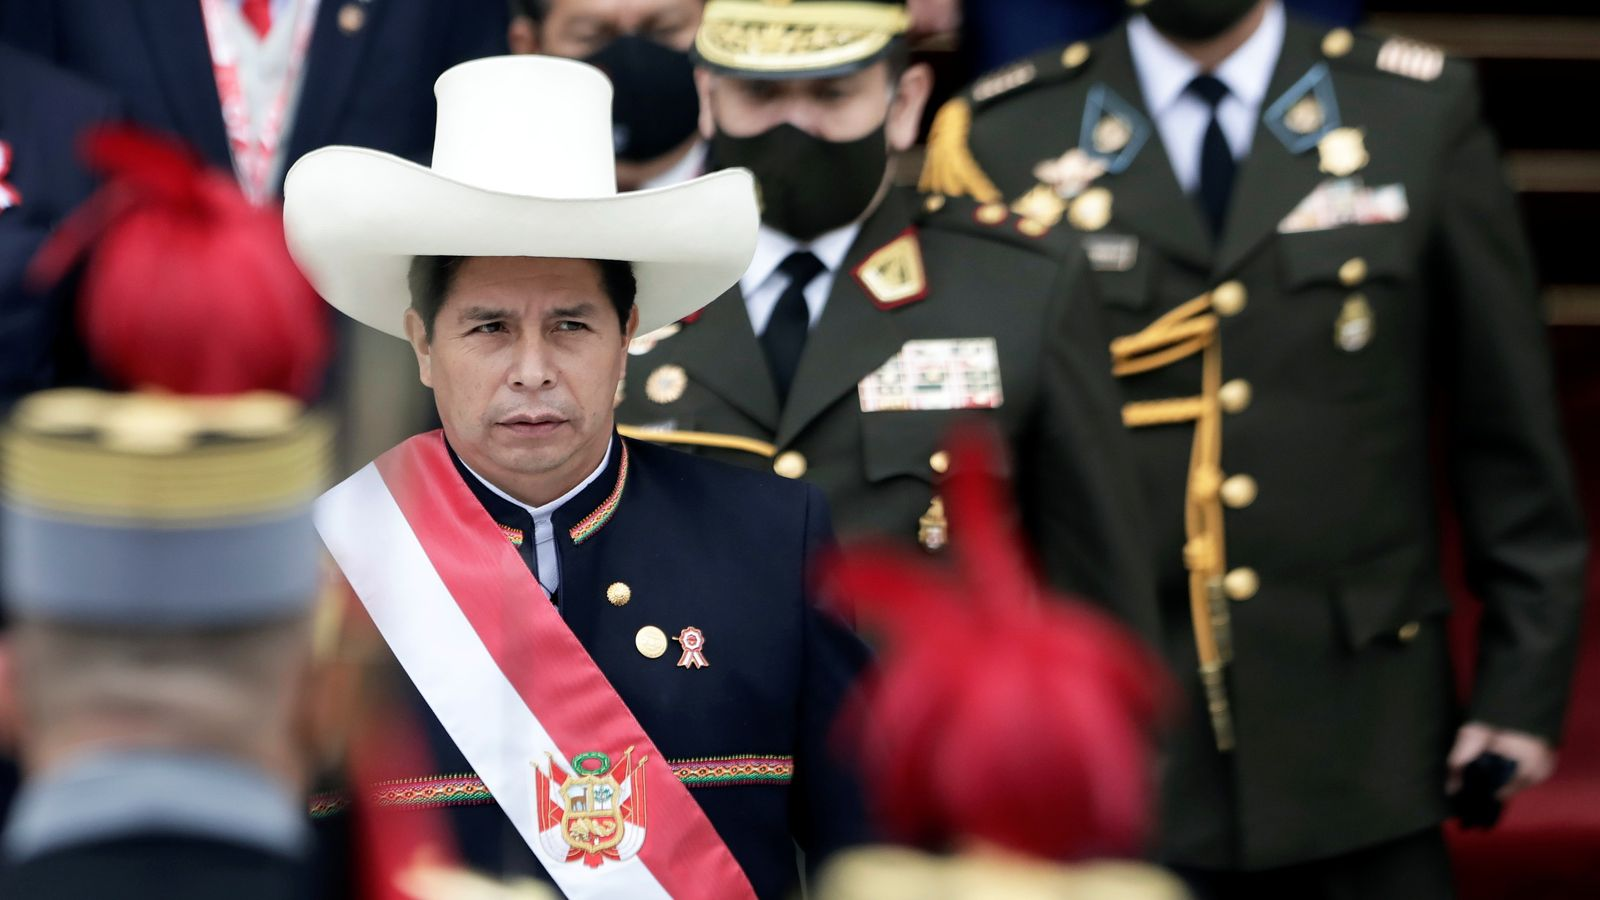 Pedro Castillo: Left-wing rural teacher becomes Peru's president, promising a new constitution